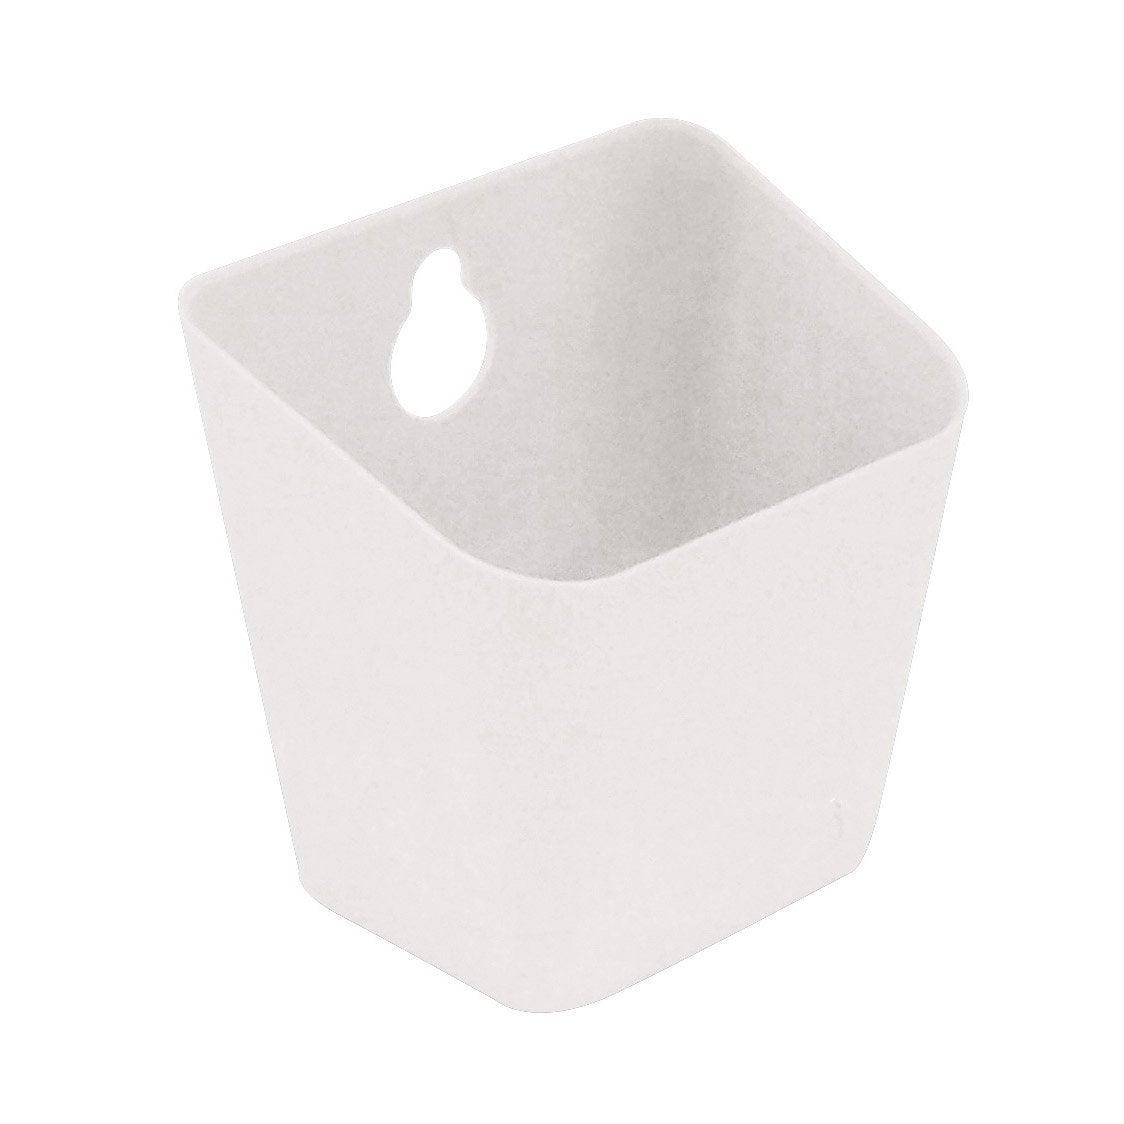 boites de rangement plastique leroy merlin. Black Bedroom Furniture Sets. Home Design Ideas